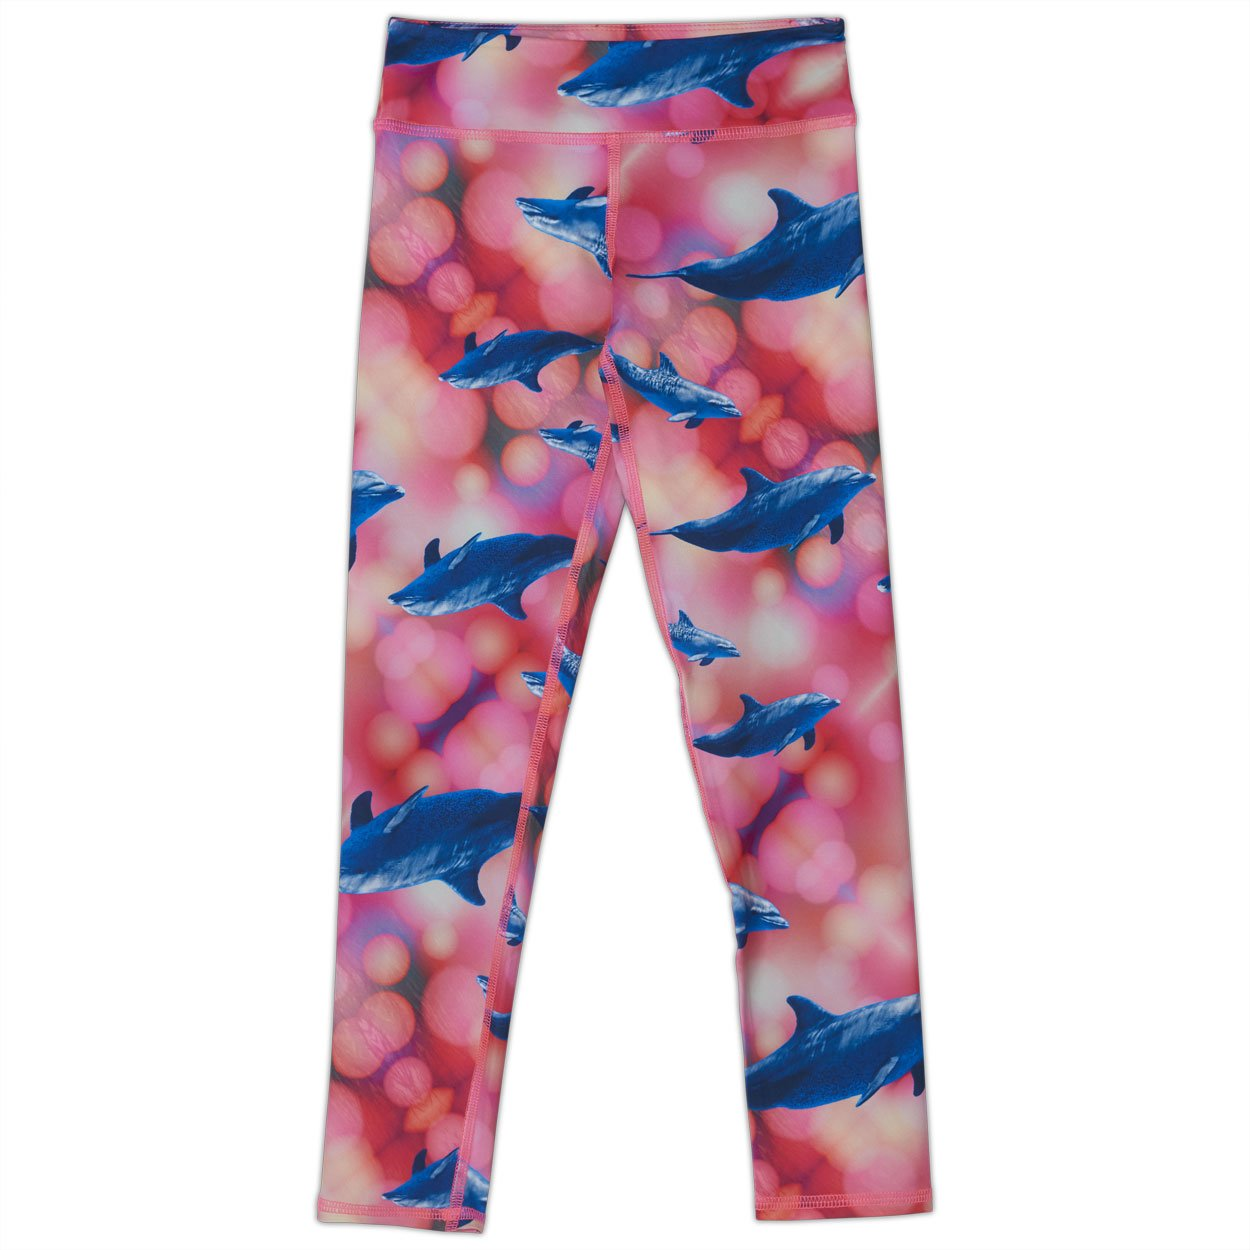 Pink Dolphin Hybrid Youth Leggings UPF 50+